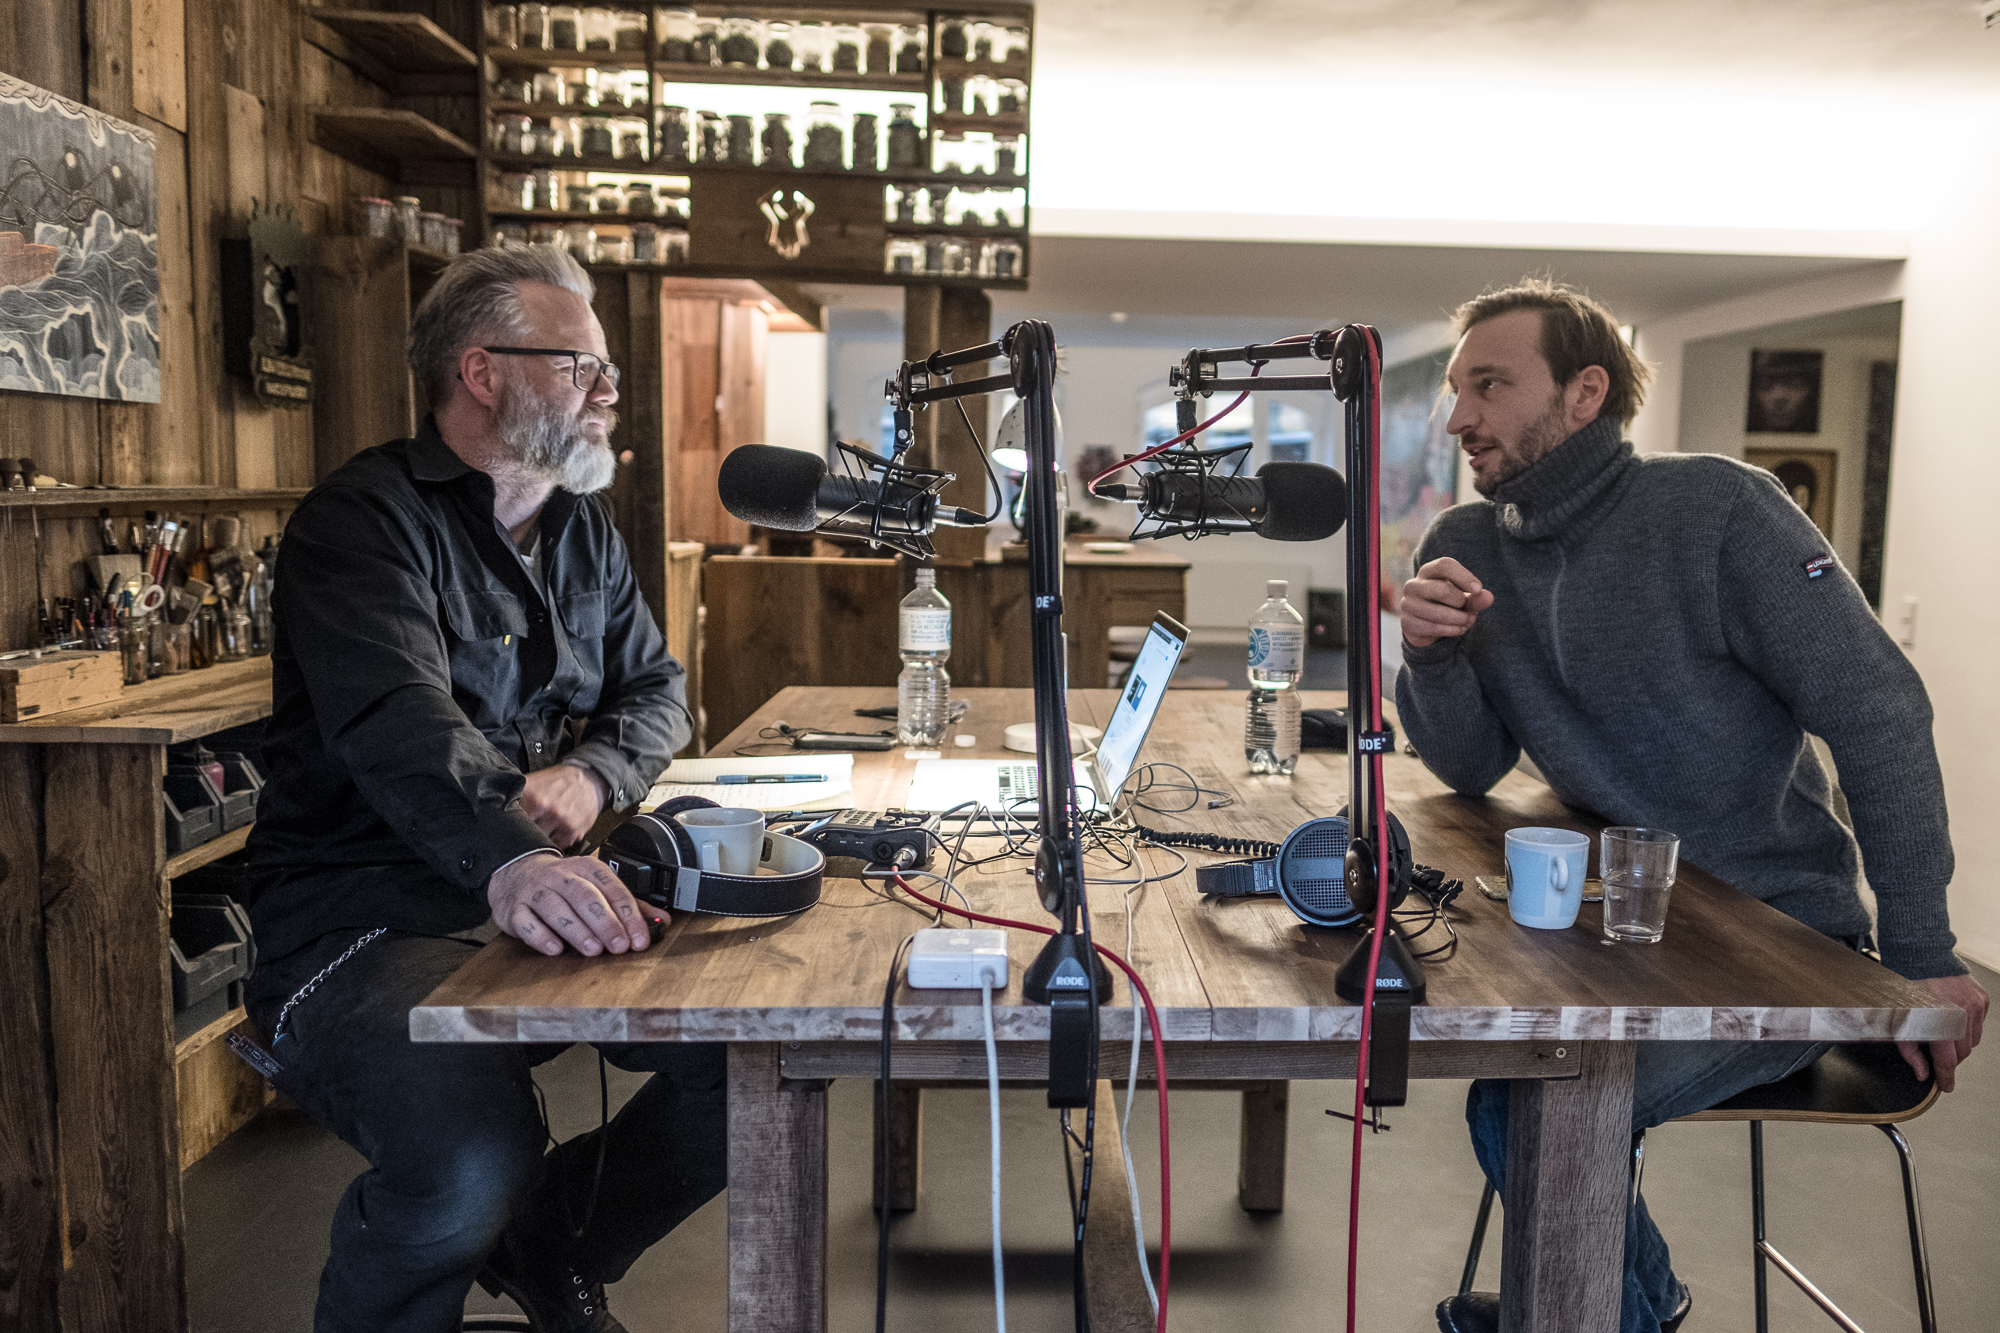 Recording a heliumTALK Podcast at heliumcowboy. With Darko C. Nicolic, February 2018.